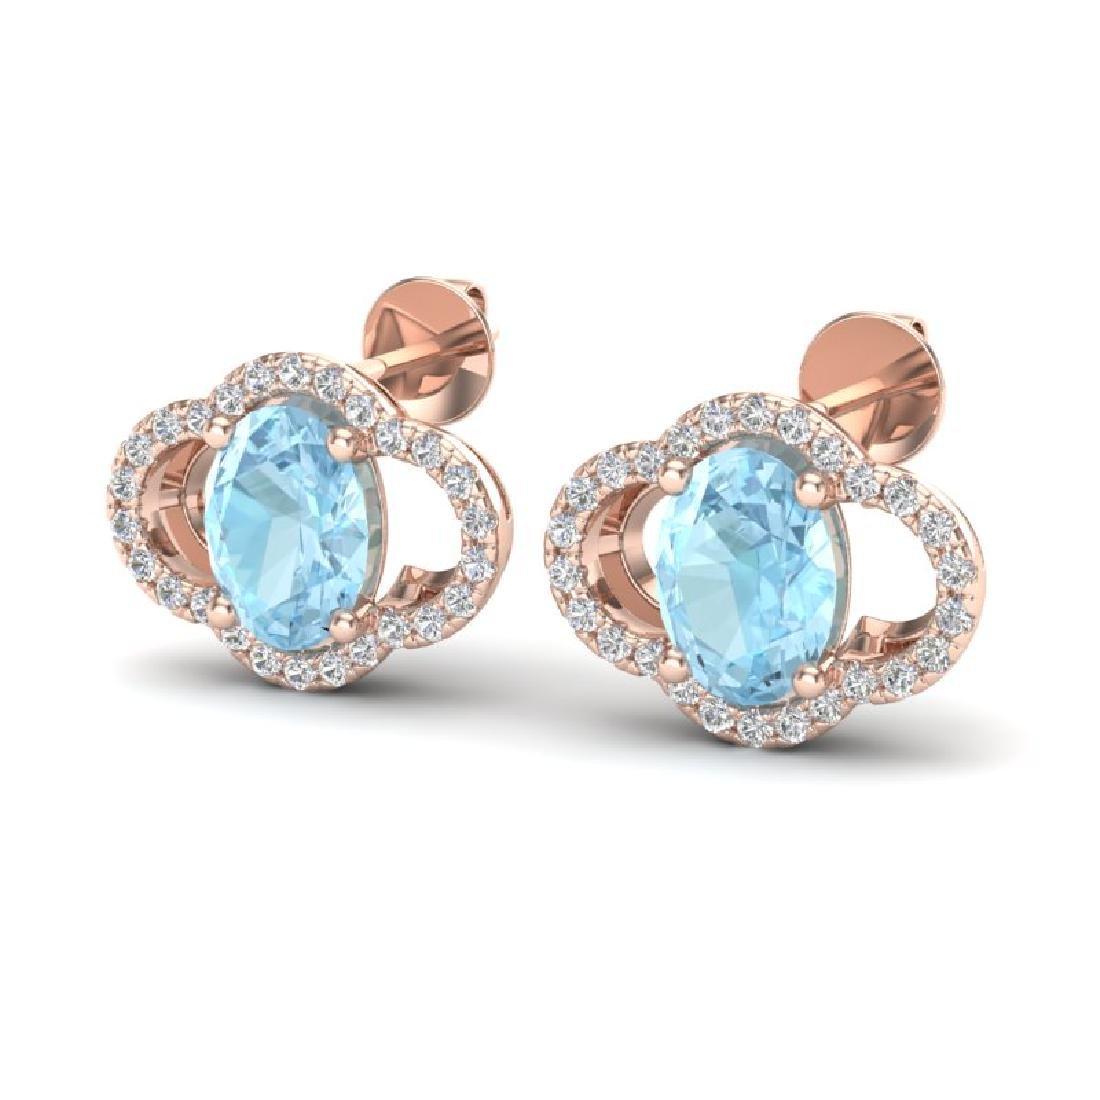 4 CTW Aquamarine & Micro Pave VS/SI Diamond Earrings